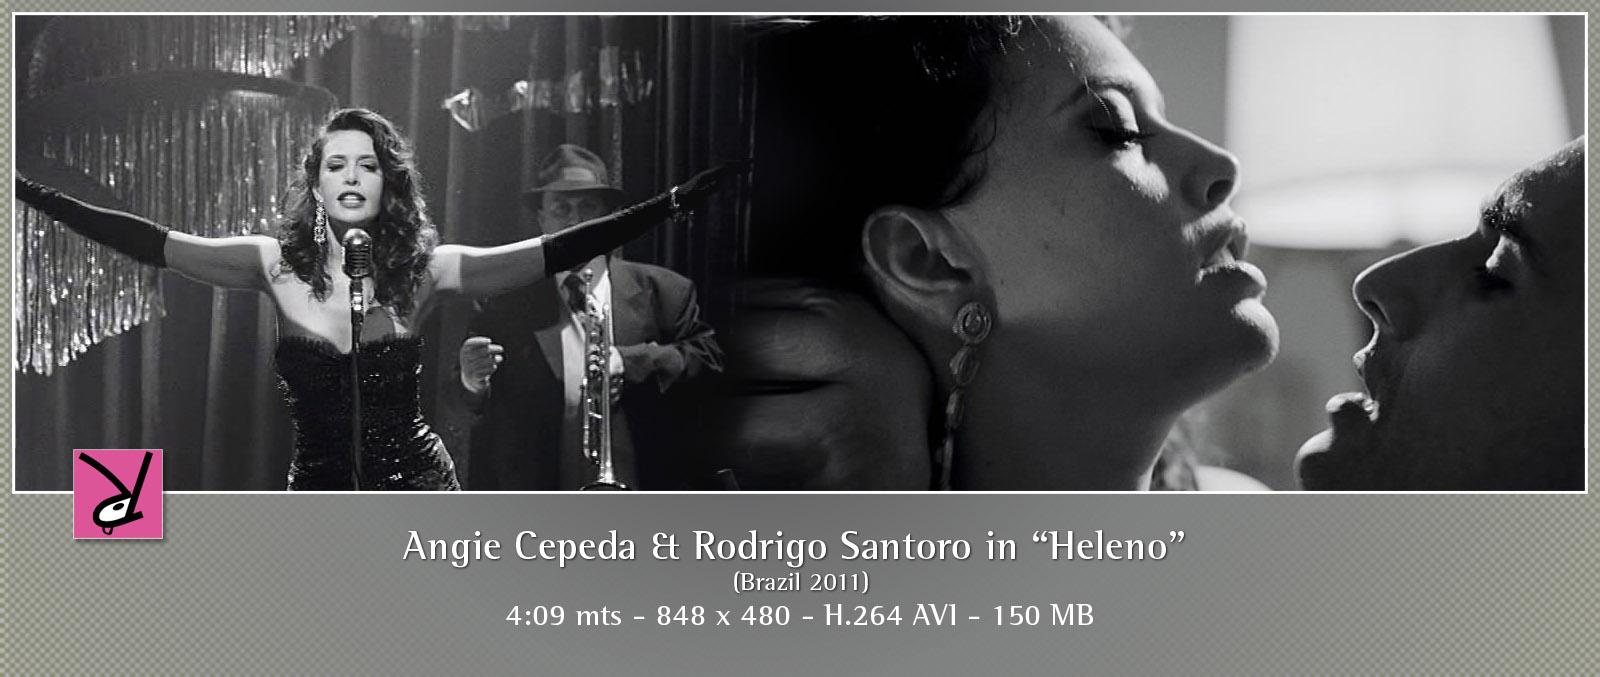 "Angie Cepeda Scene angie cepeda and rodrigo santoro in ""heleno"" | thirstyrabbit"